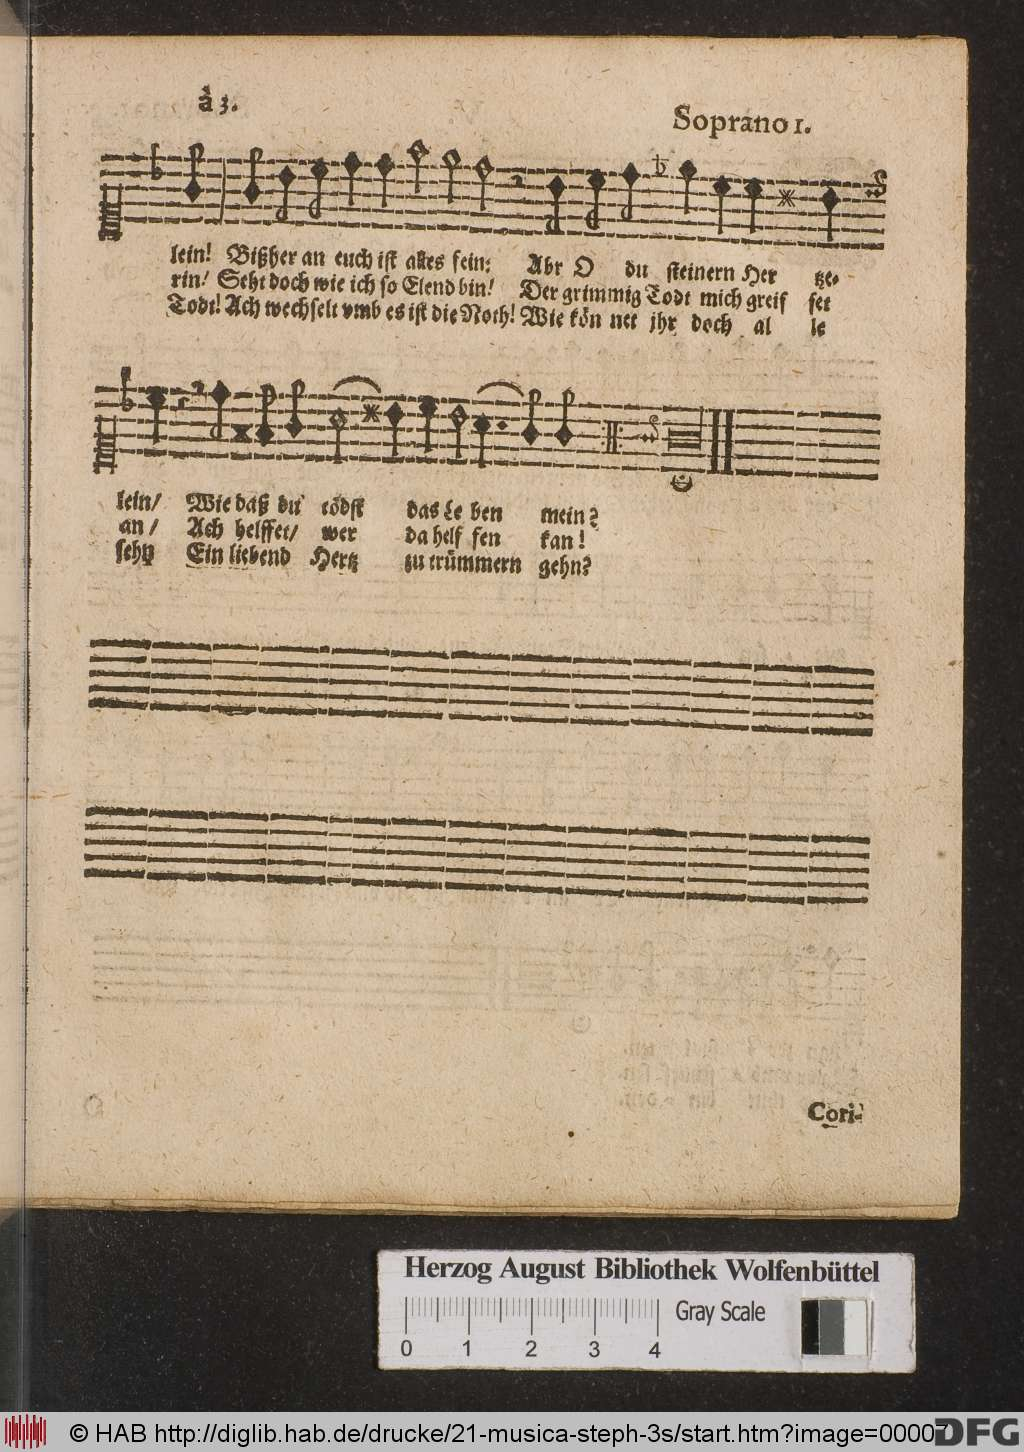 http://diglib.hab.de/drucke/21-musica-steph-3s/00007.jpg